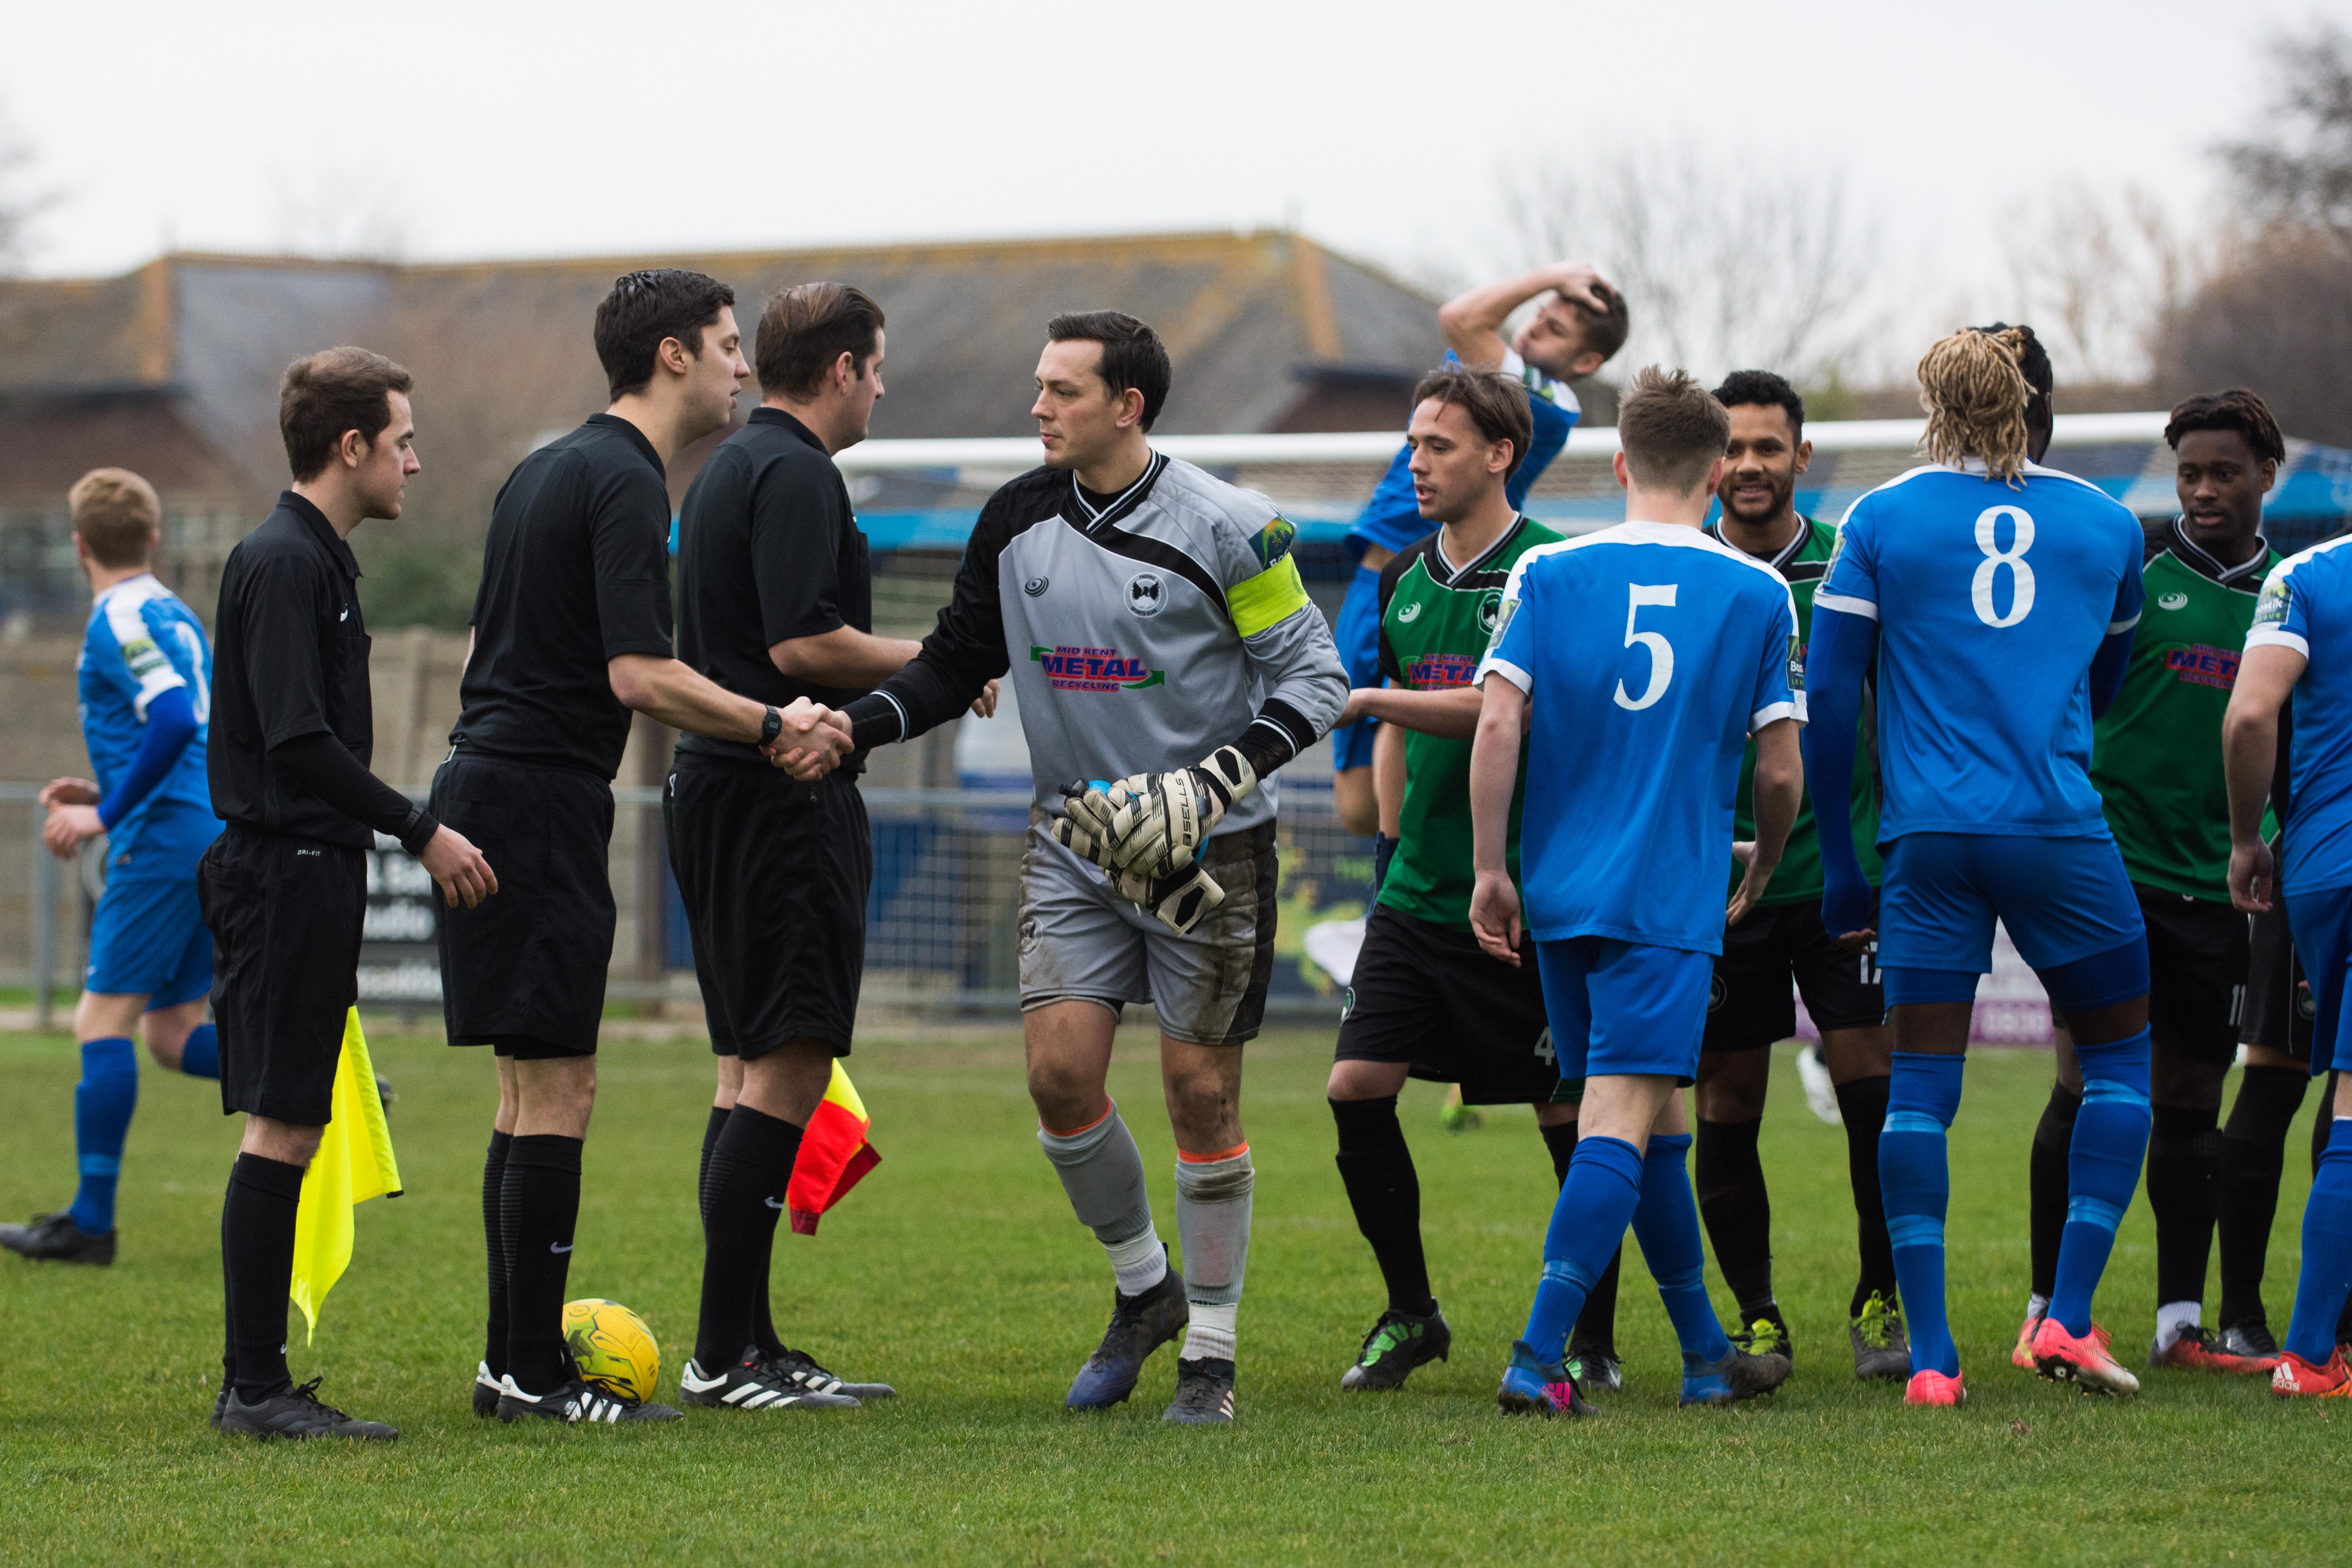 Shoreham FC vs Phoenix Sports 13.01.18 15